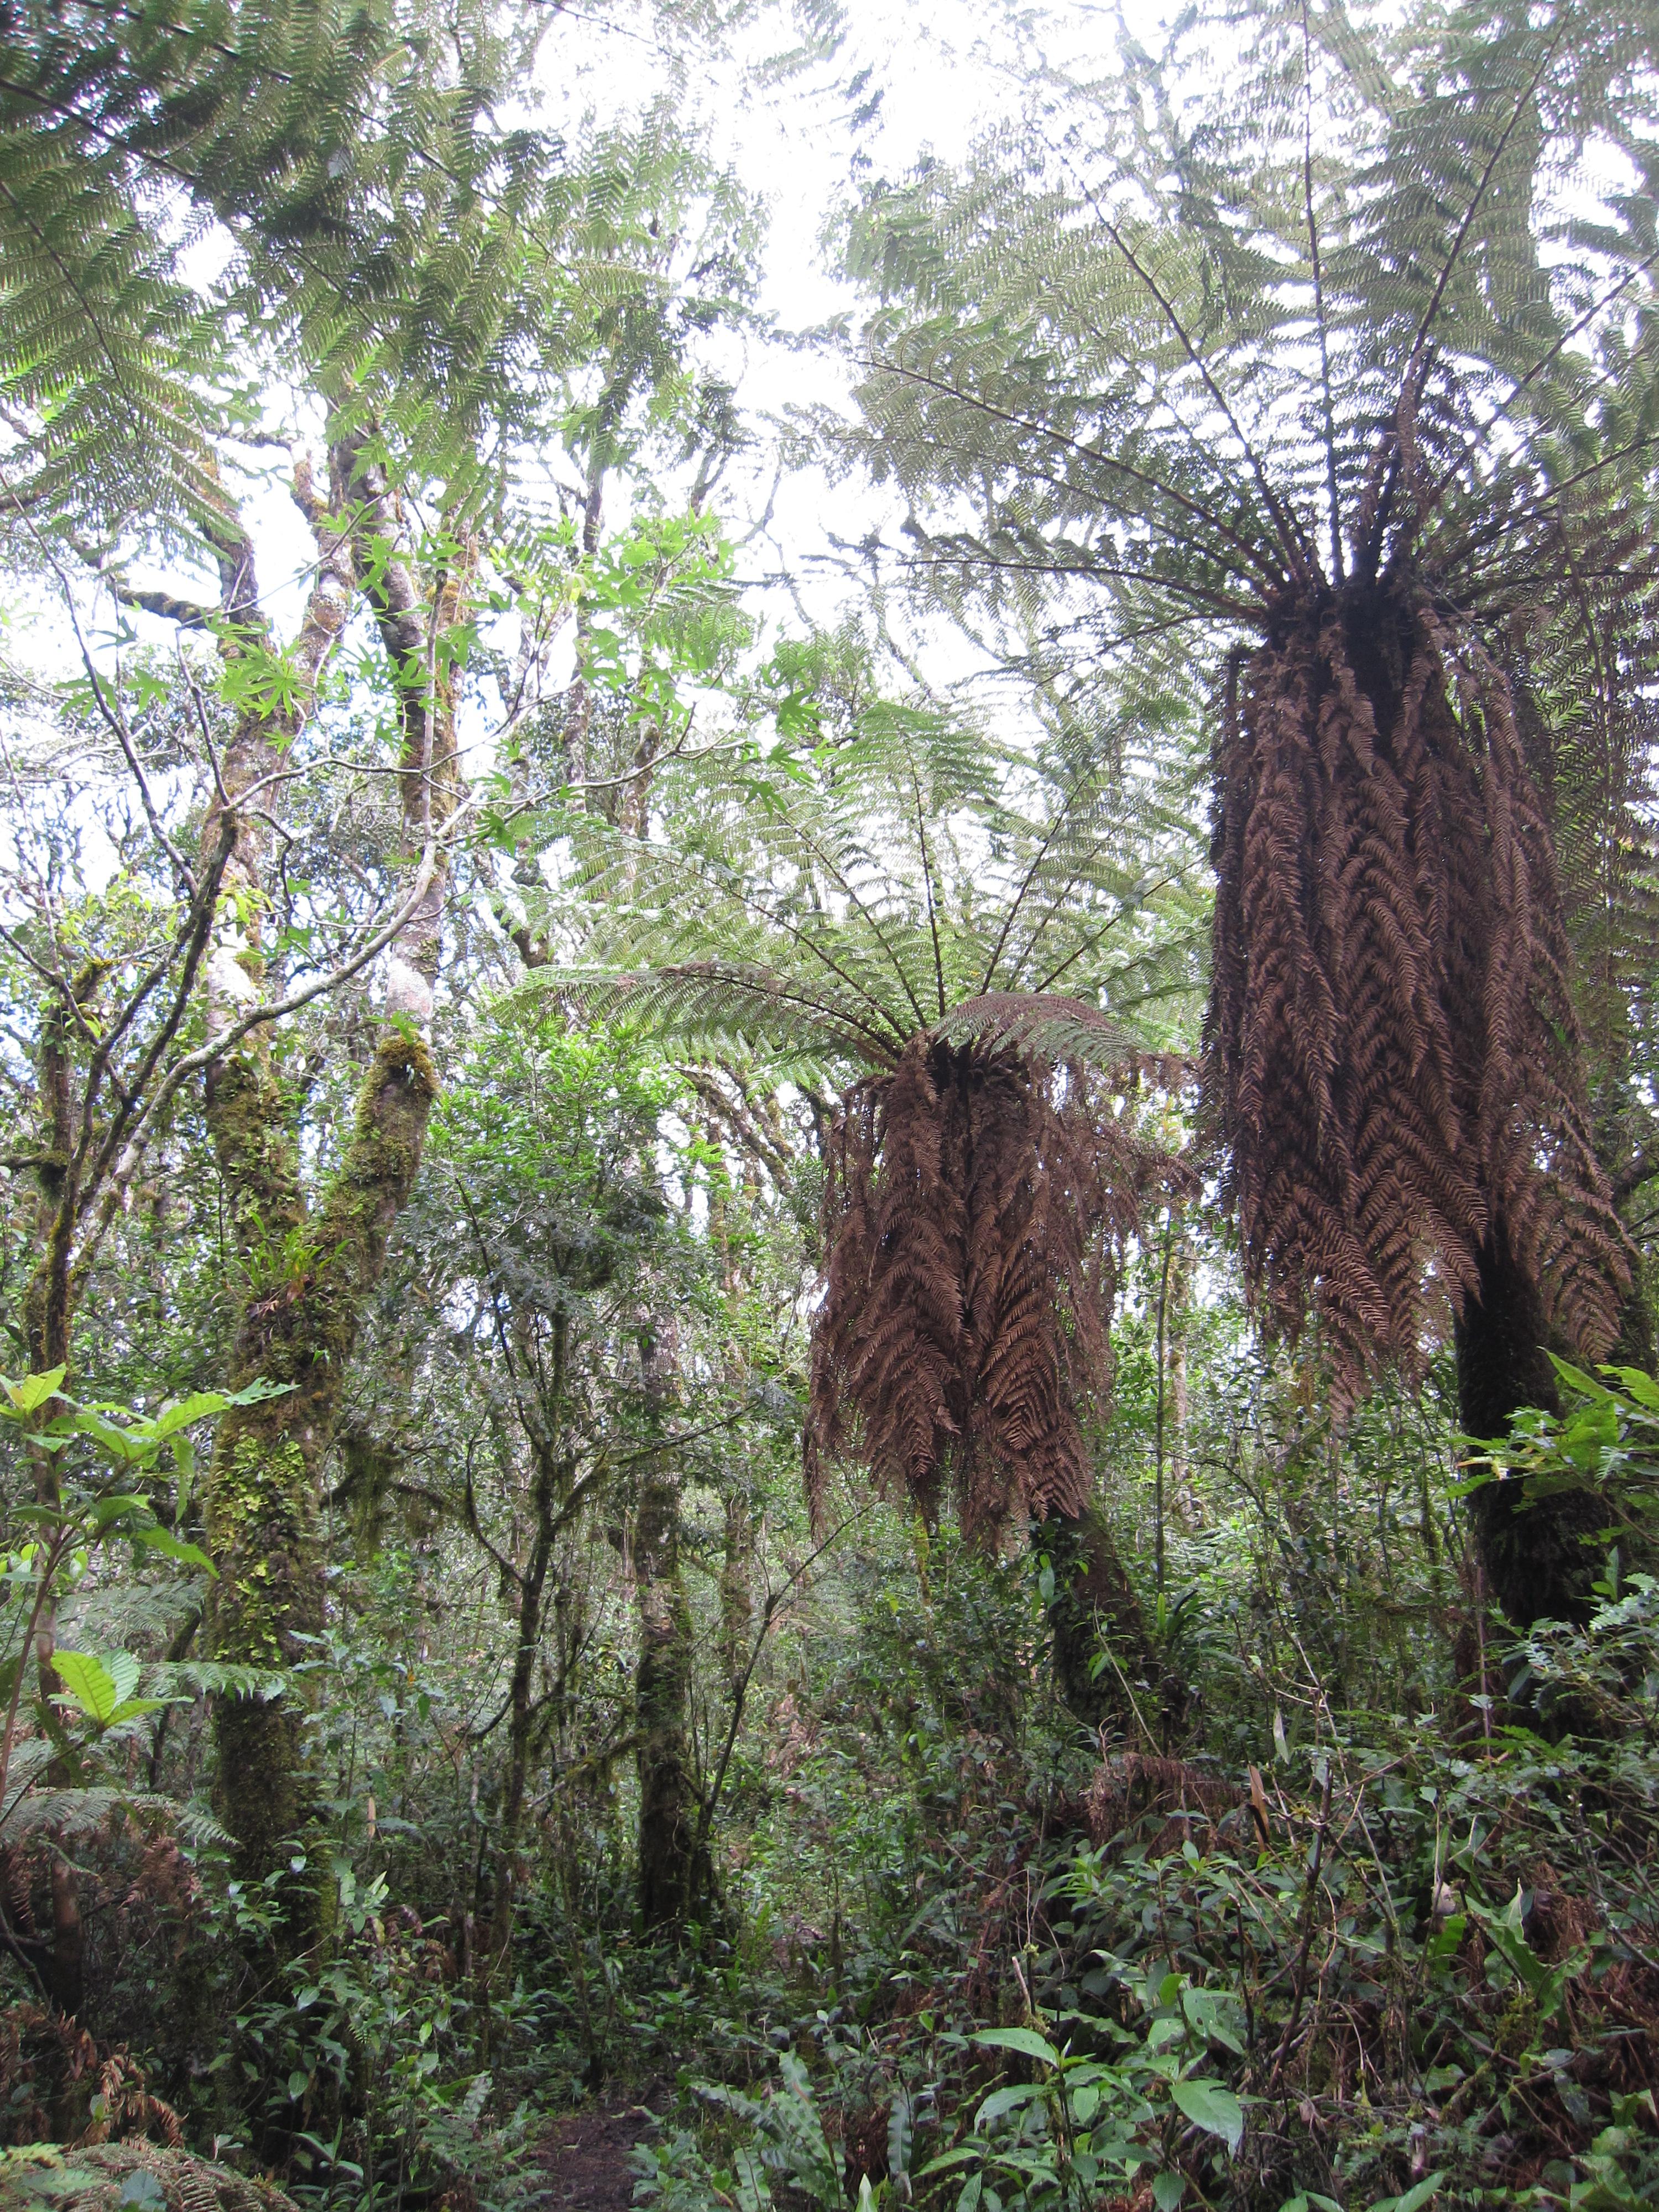 Genus of tree ferns dating back to jurassic period